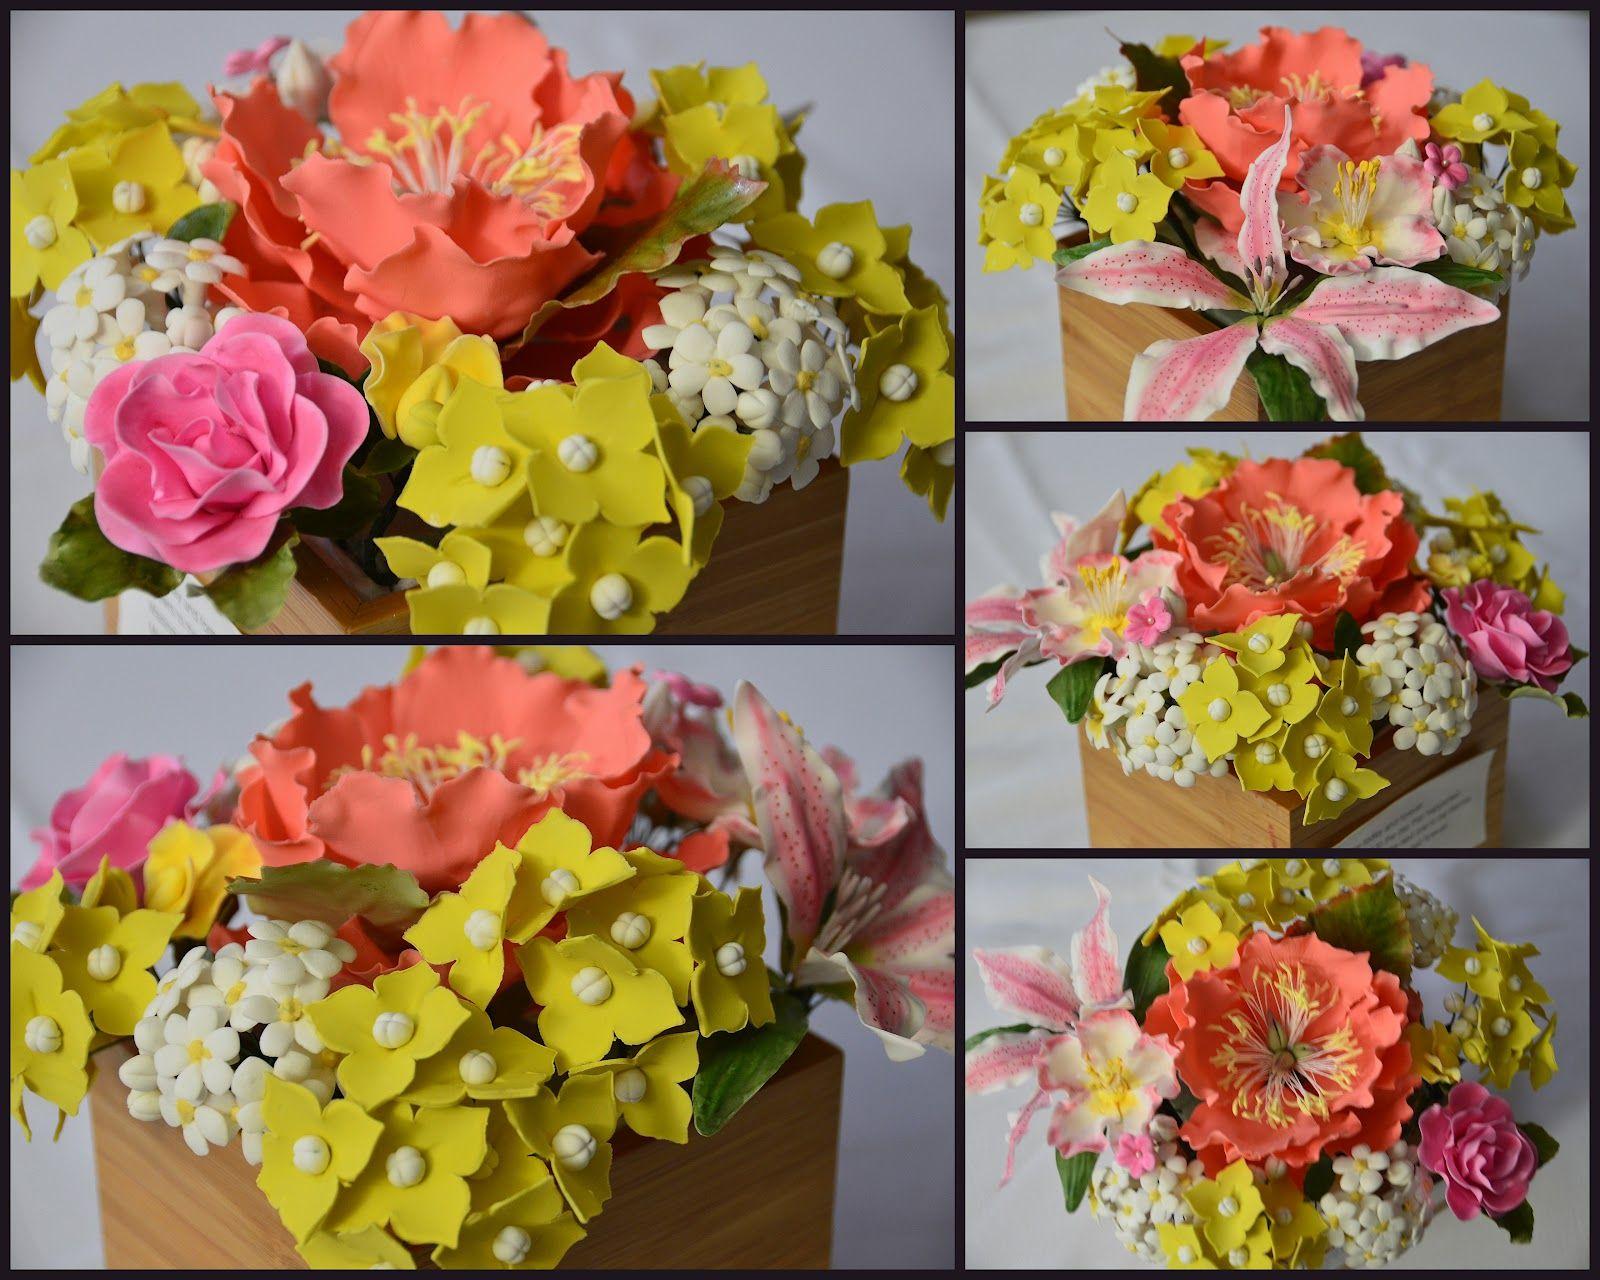 Gum+Paste+Flowers_Apr+25.jpg (1600×1280) | ortensia | Pinterest